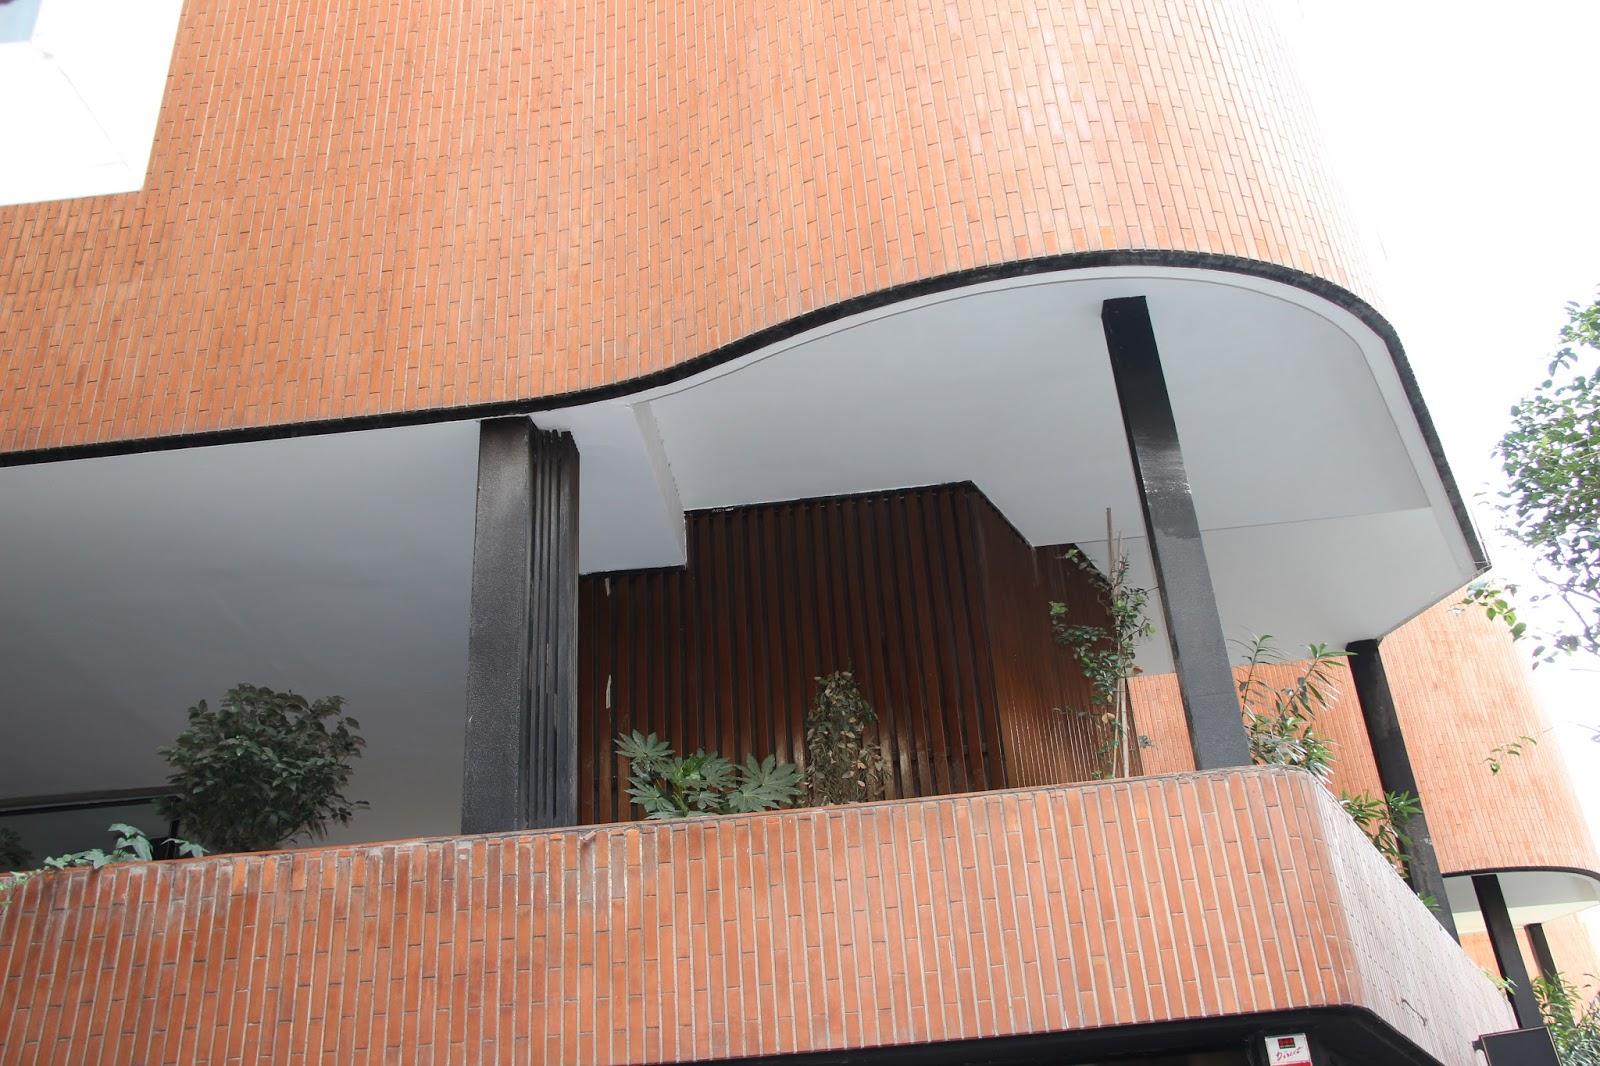 Edificio girasol jose antonio coderch madrid sf23 - Arquitectos madrid 2 0 ...